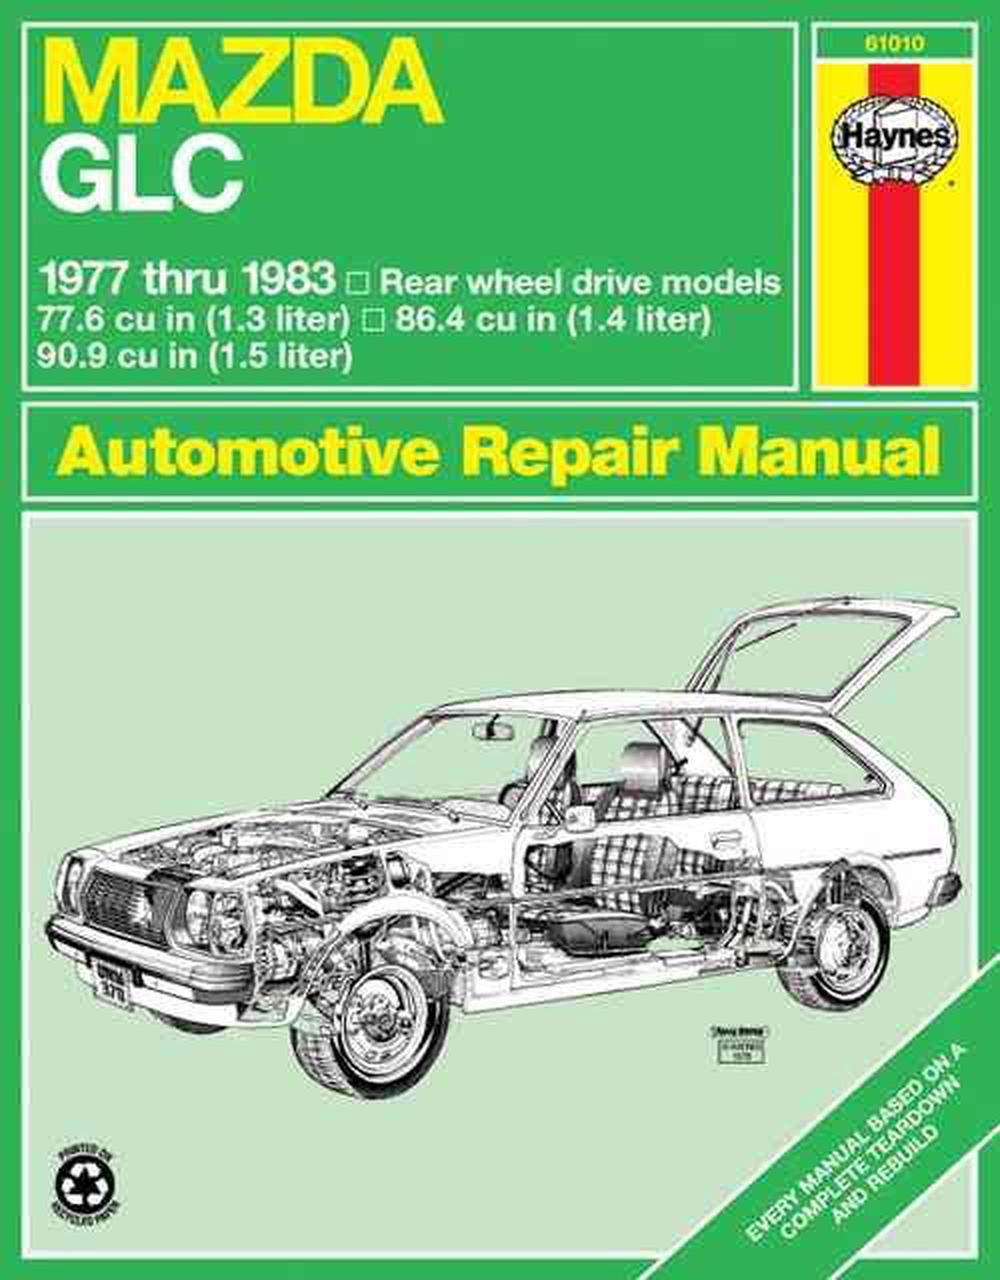 Mazda GLC (RWD) (77 - 83)